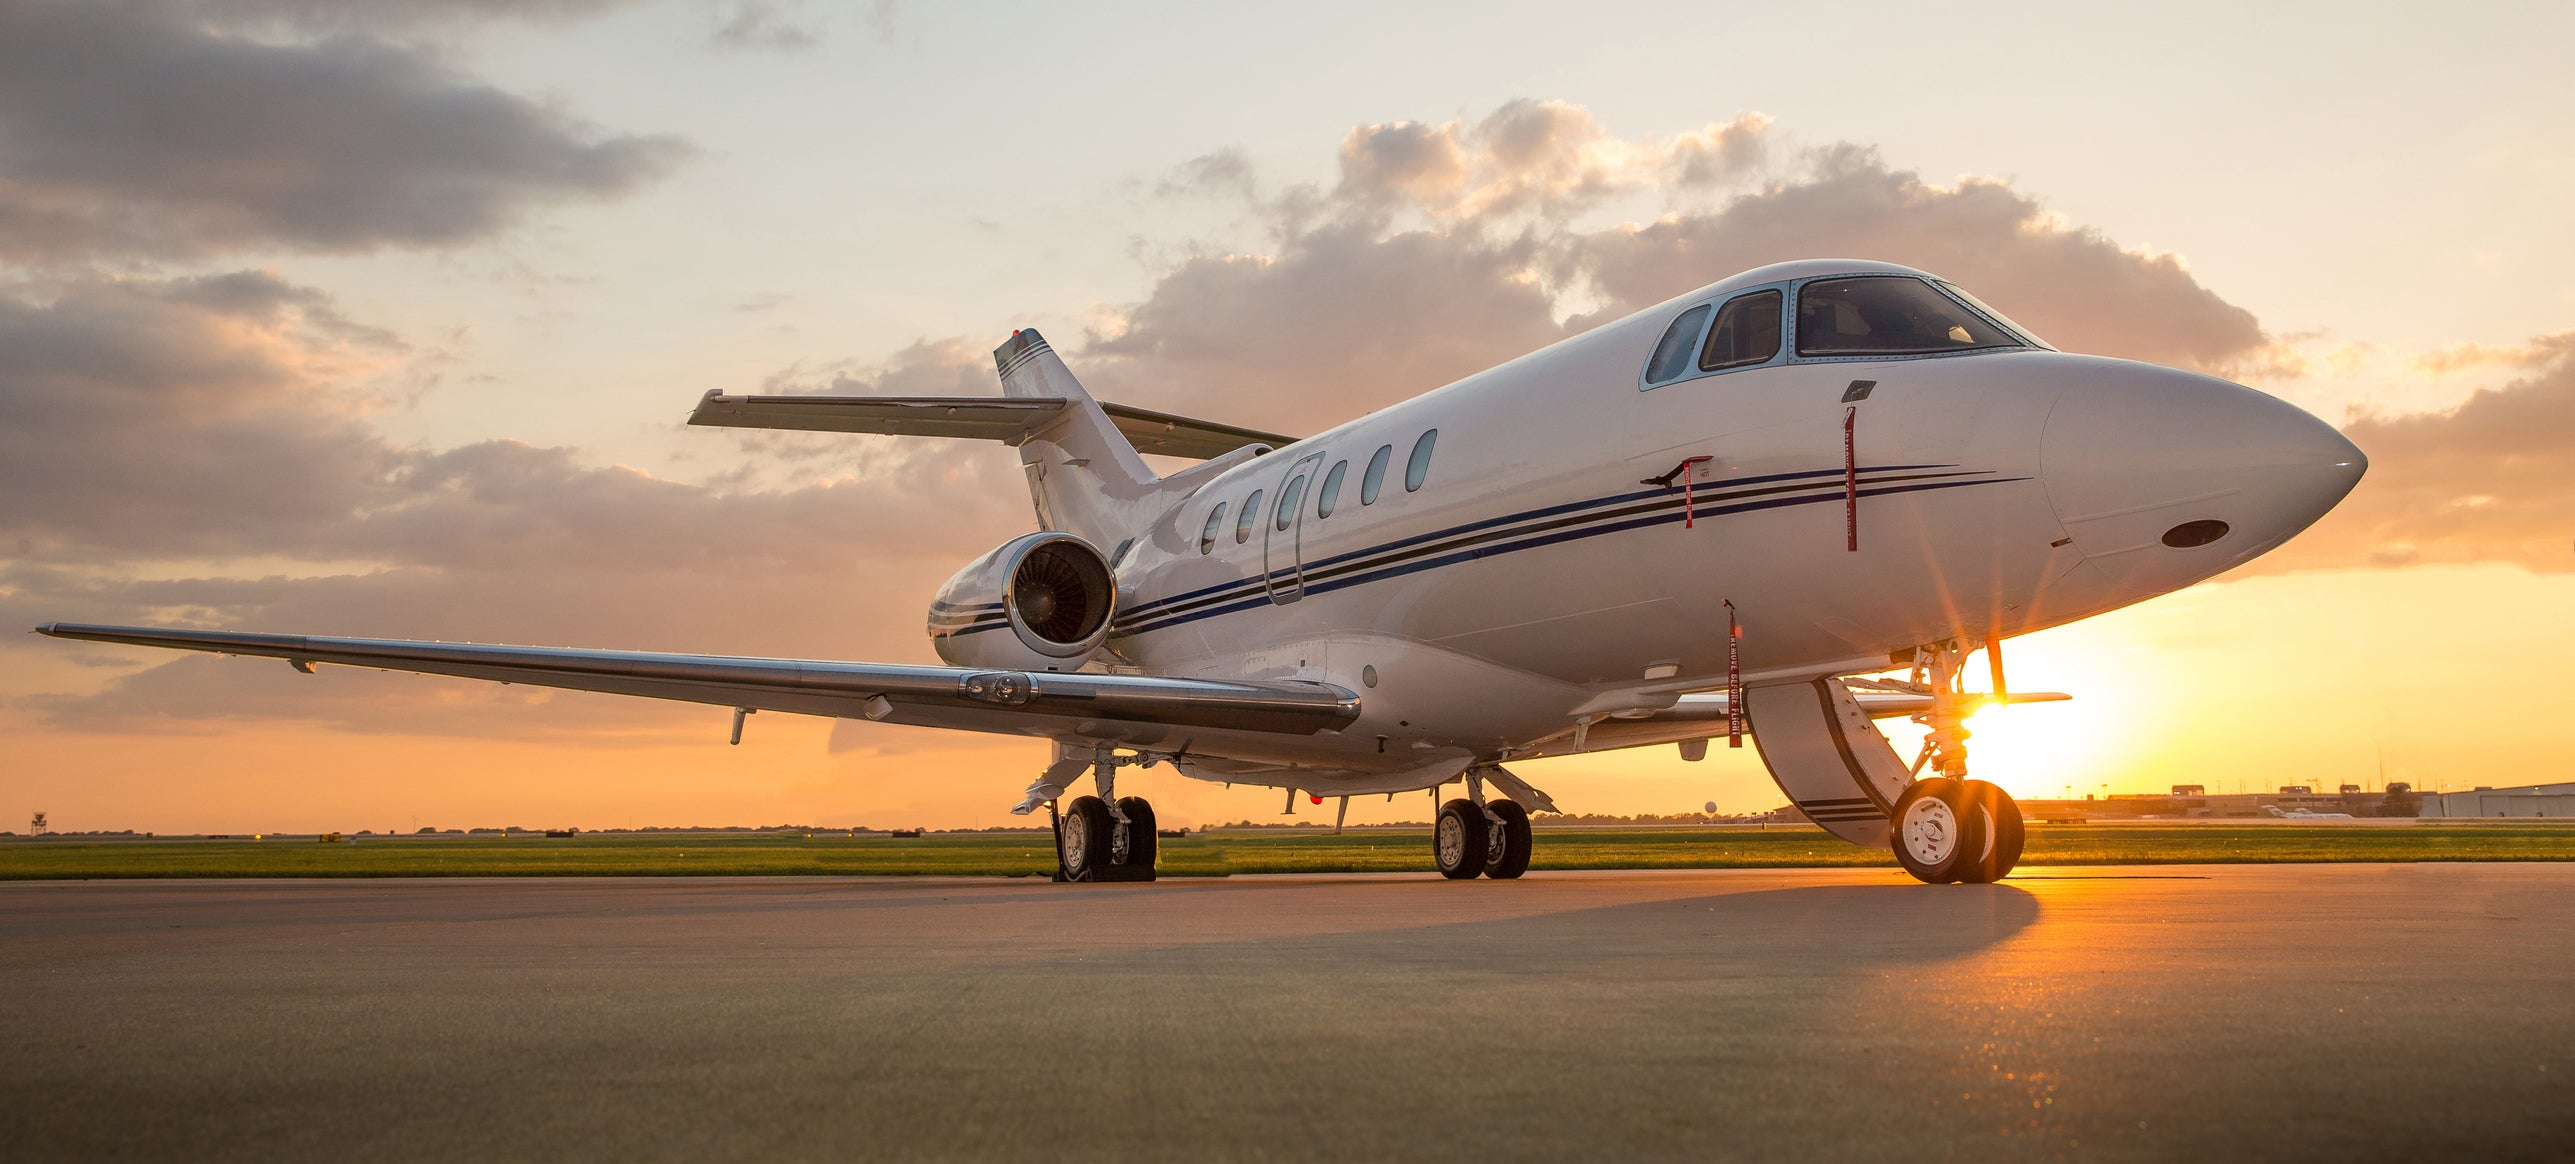 getty-private-corporate-jet.jpg